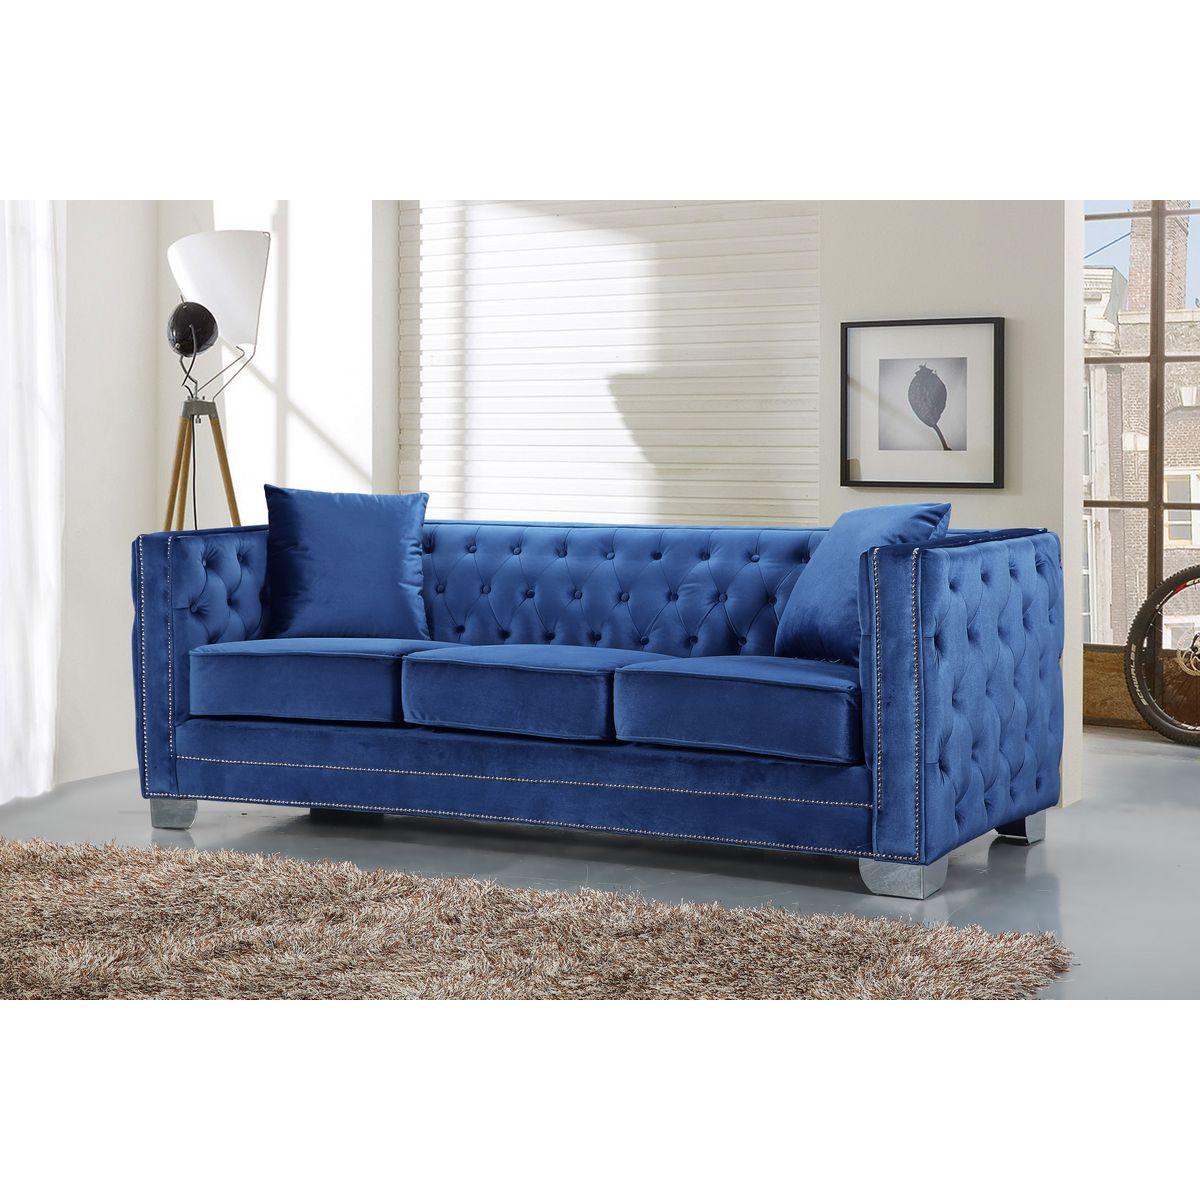 Meridian Furniture 648LtBlu S Reese Light Blue Velvet Sofa W Tufted Back Amp Arms On Metal Legs